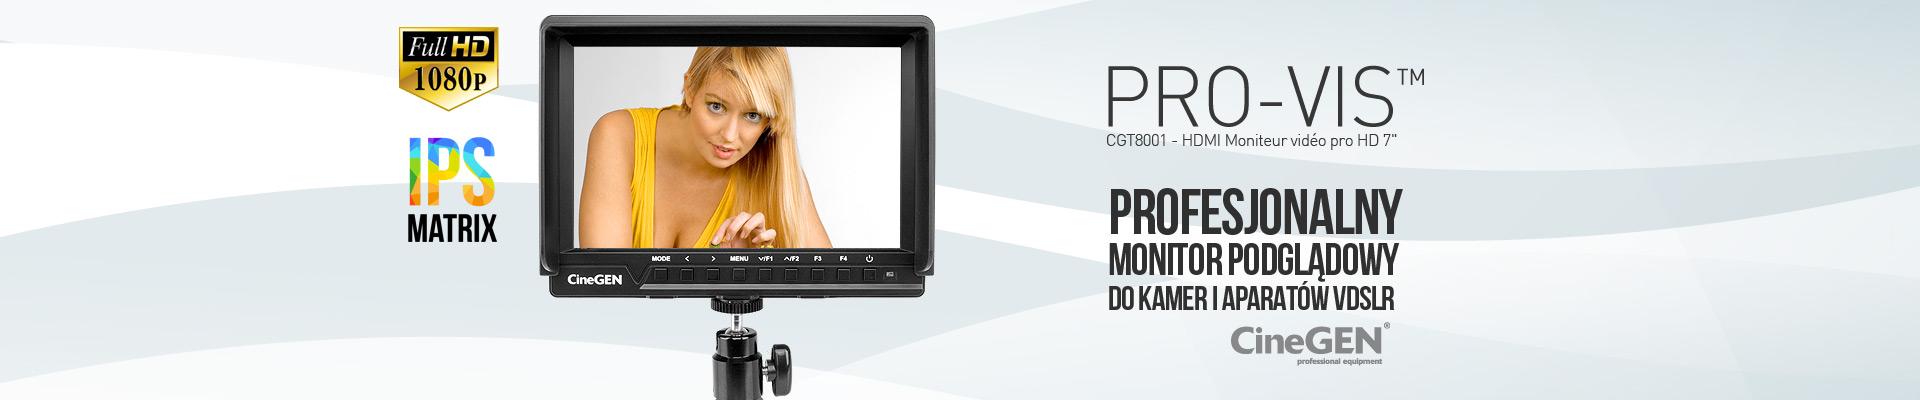 Monitor Podglądowy Pro-Vis